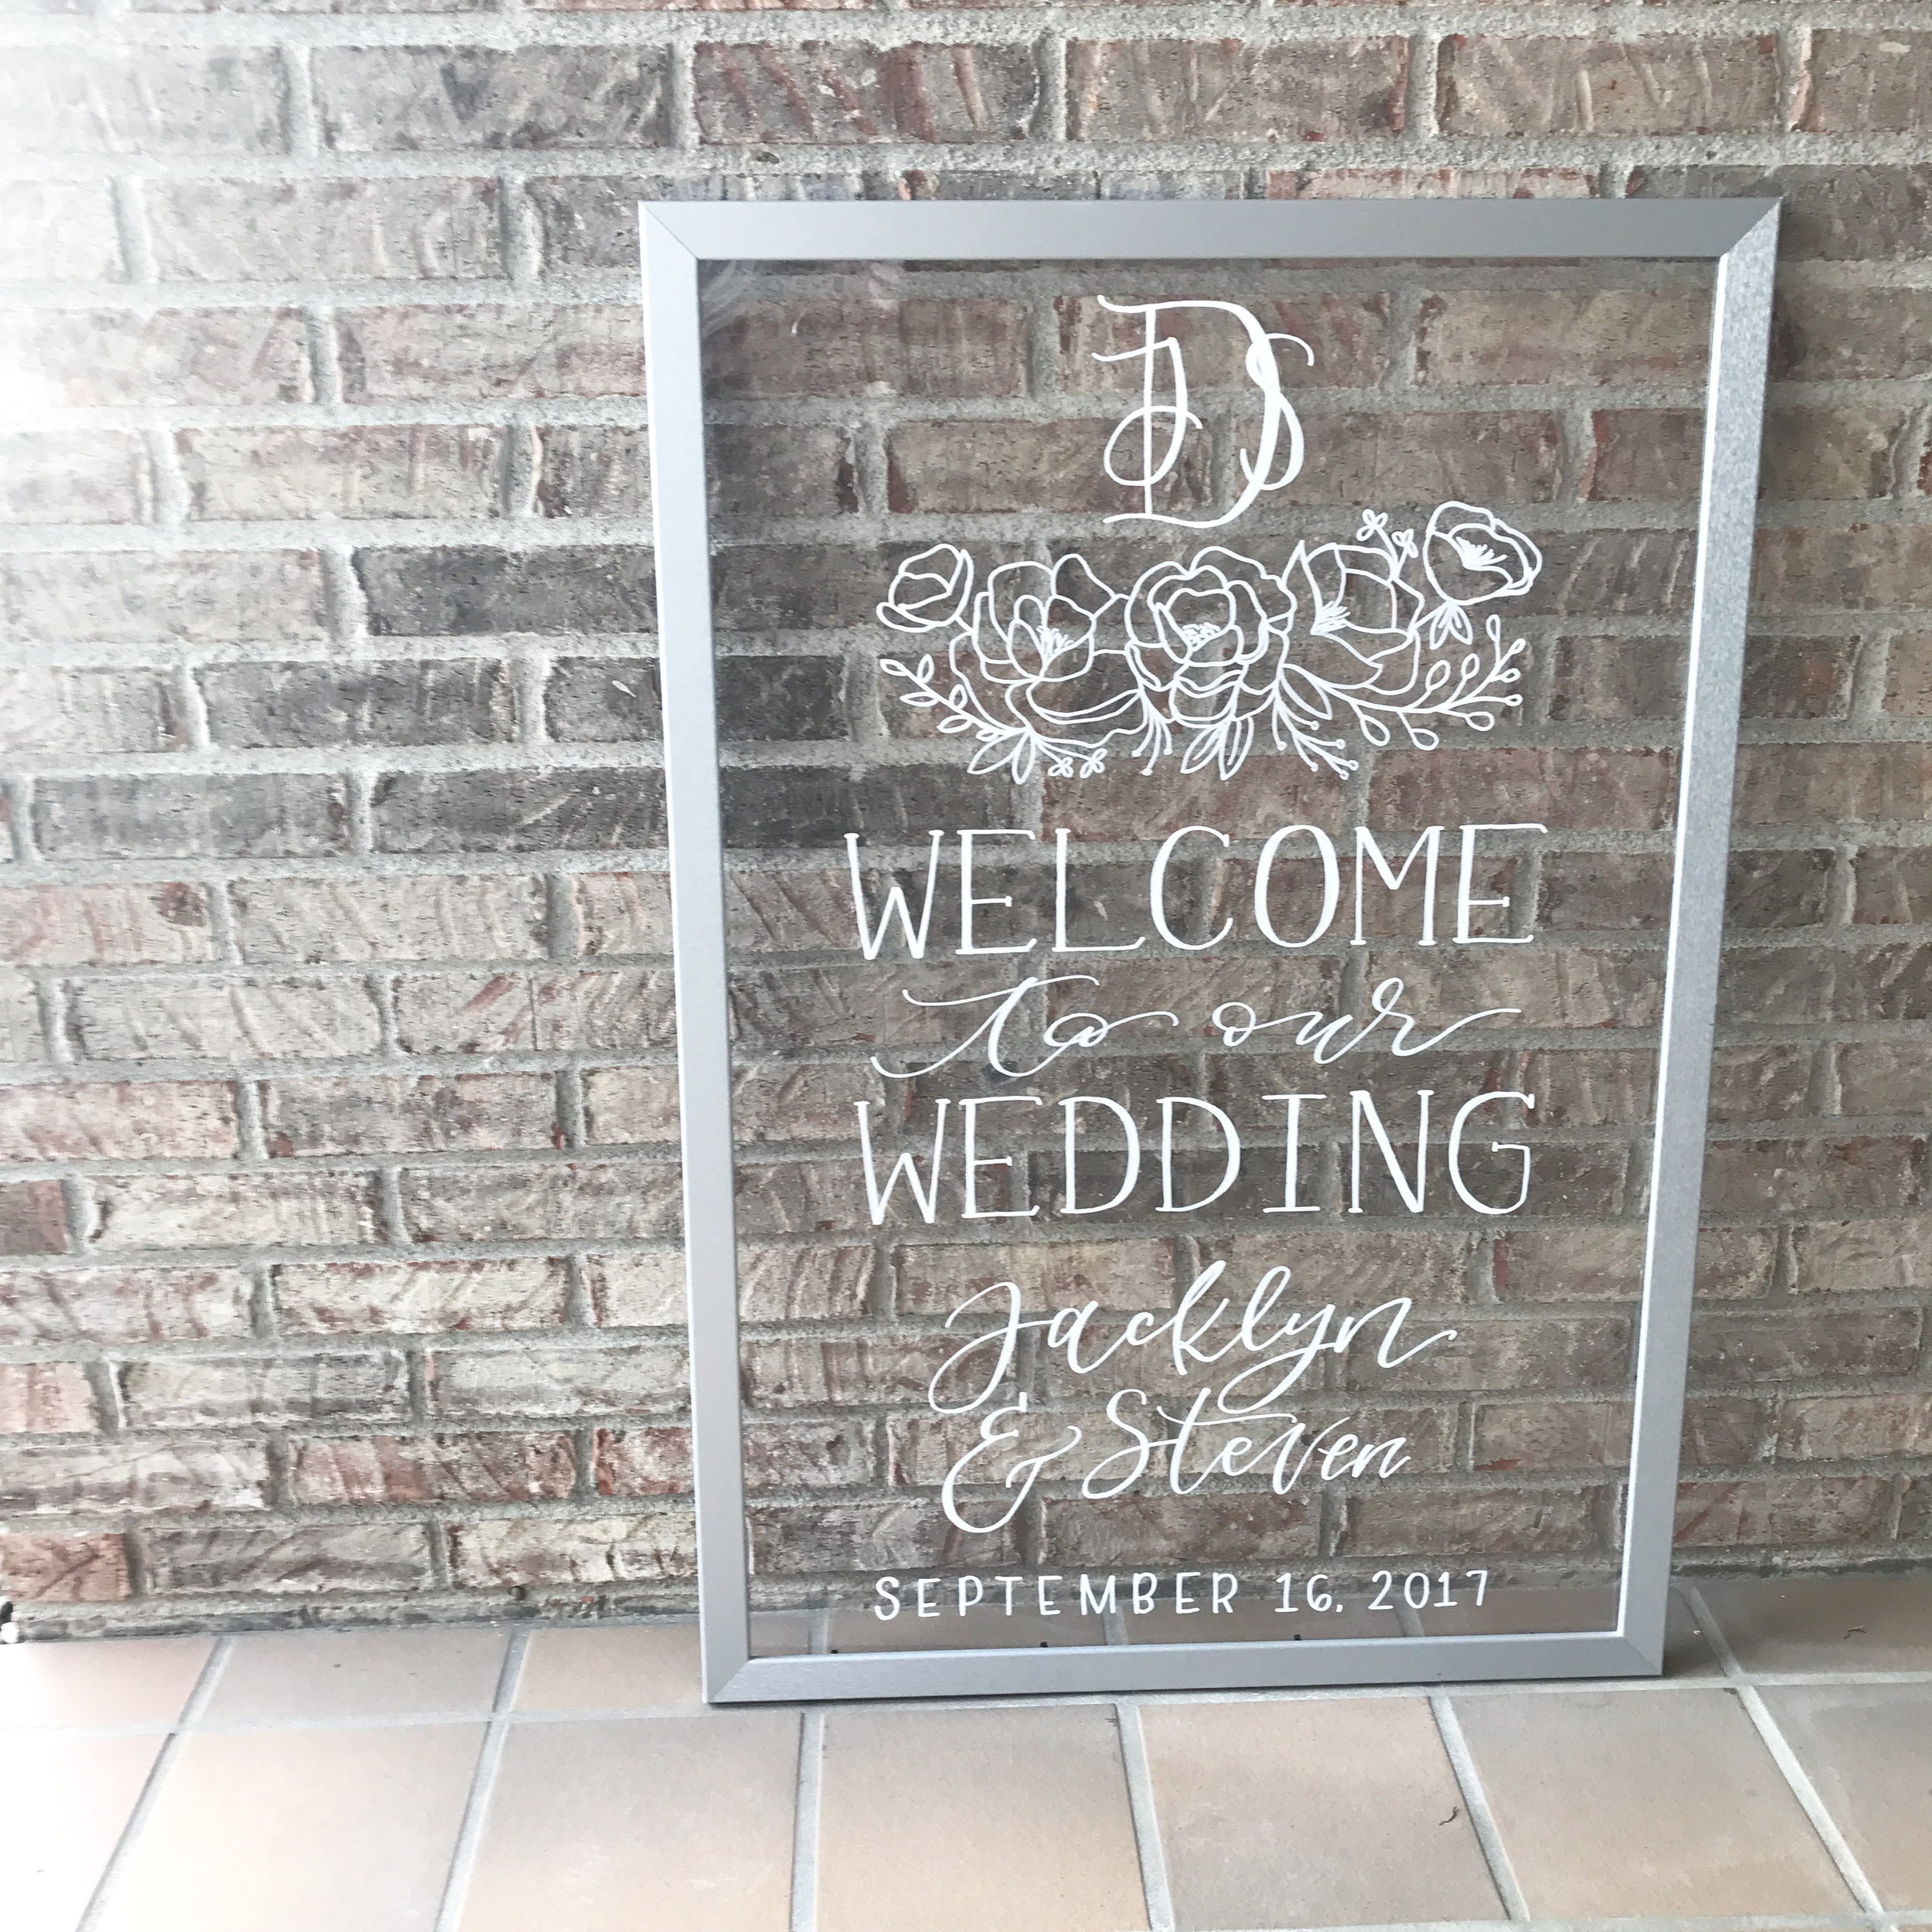 Dahn Wedding